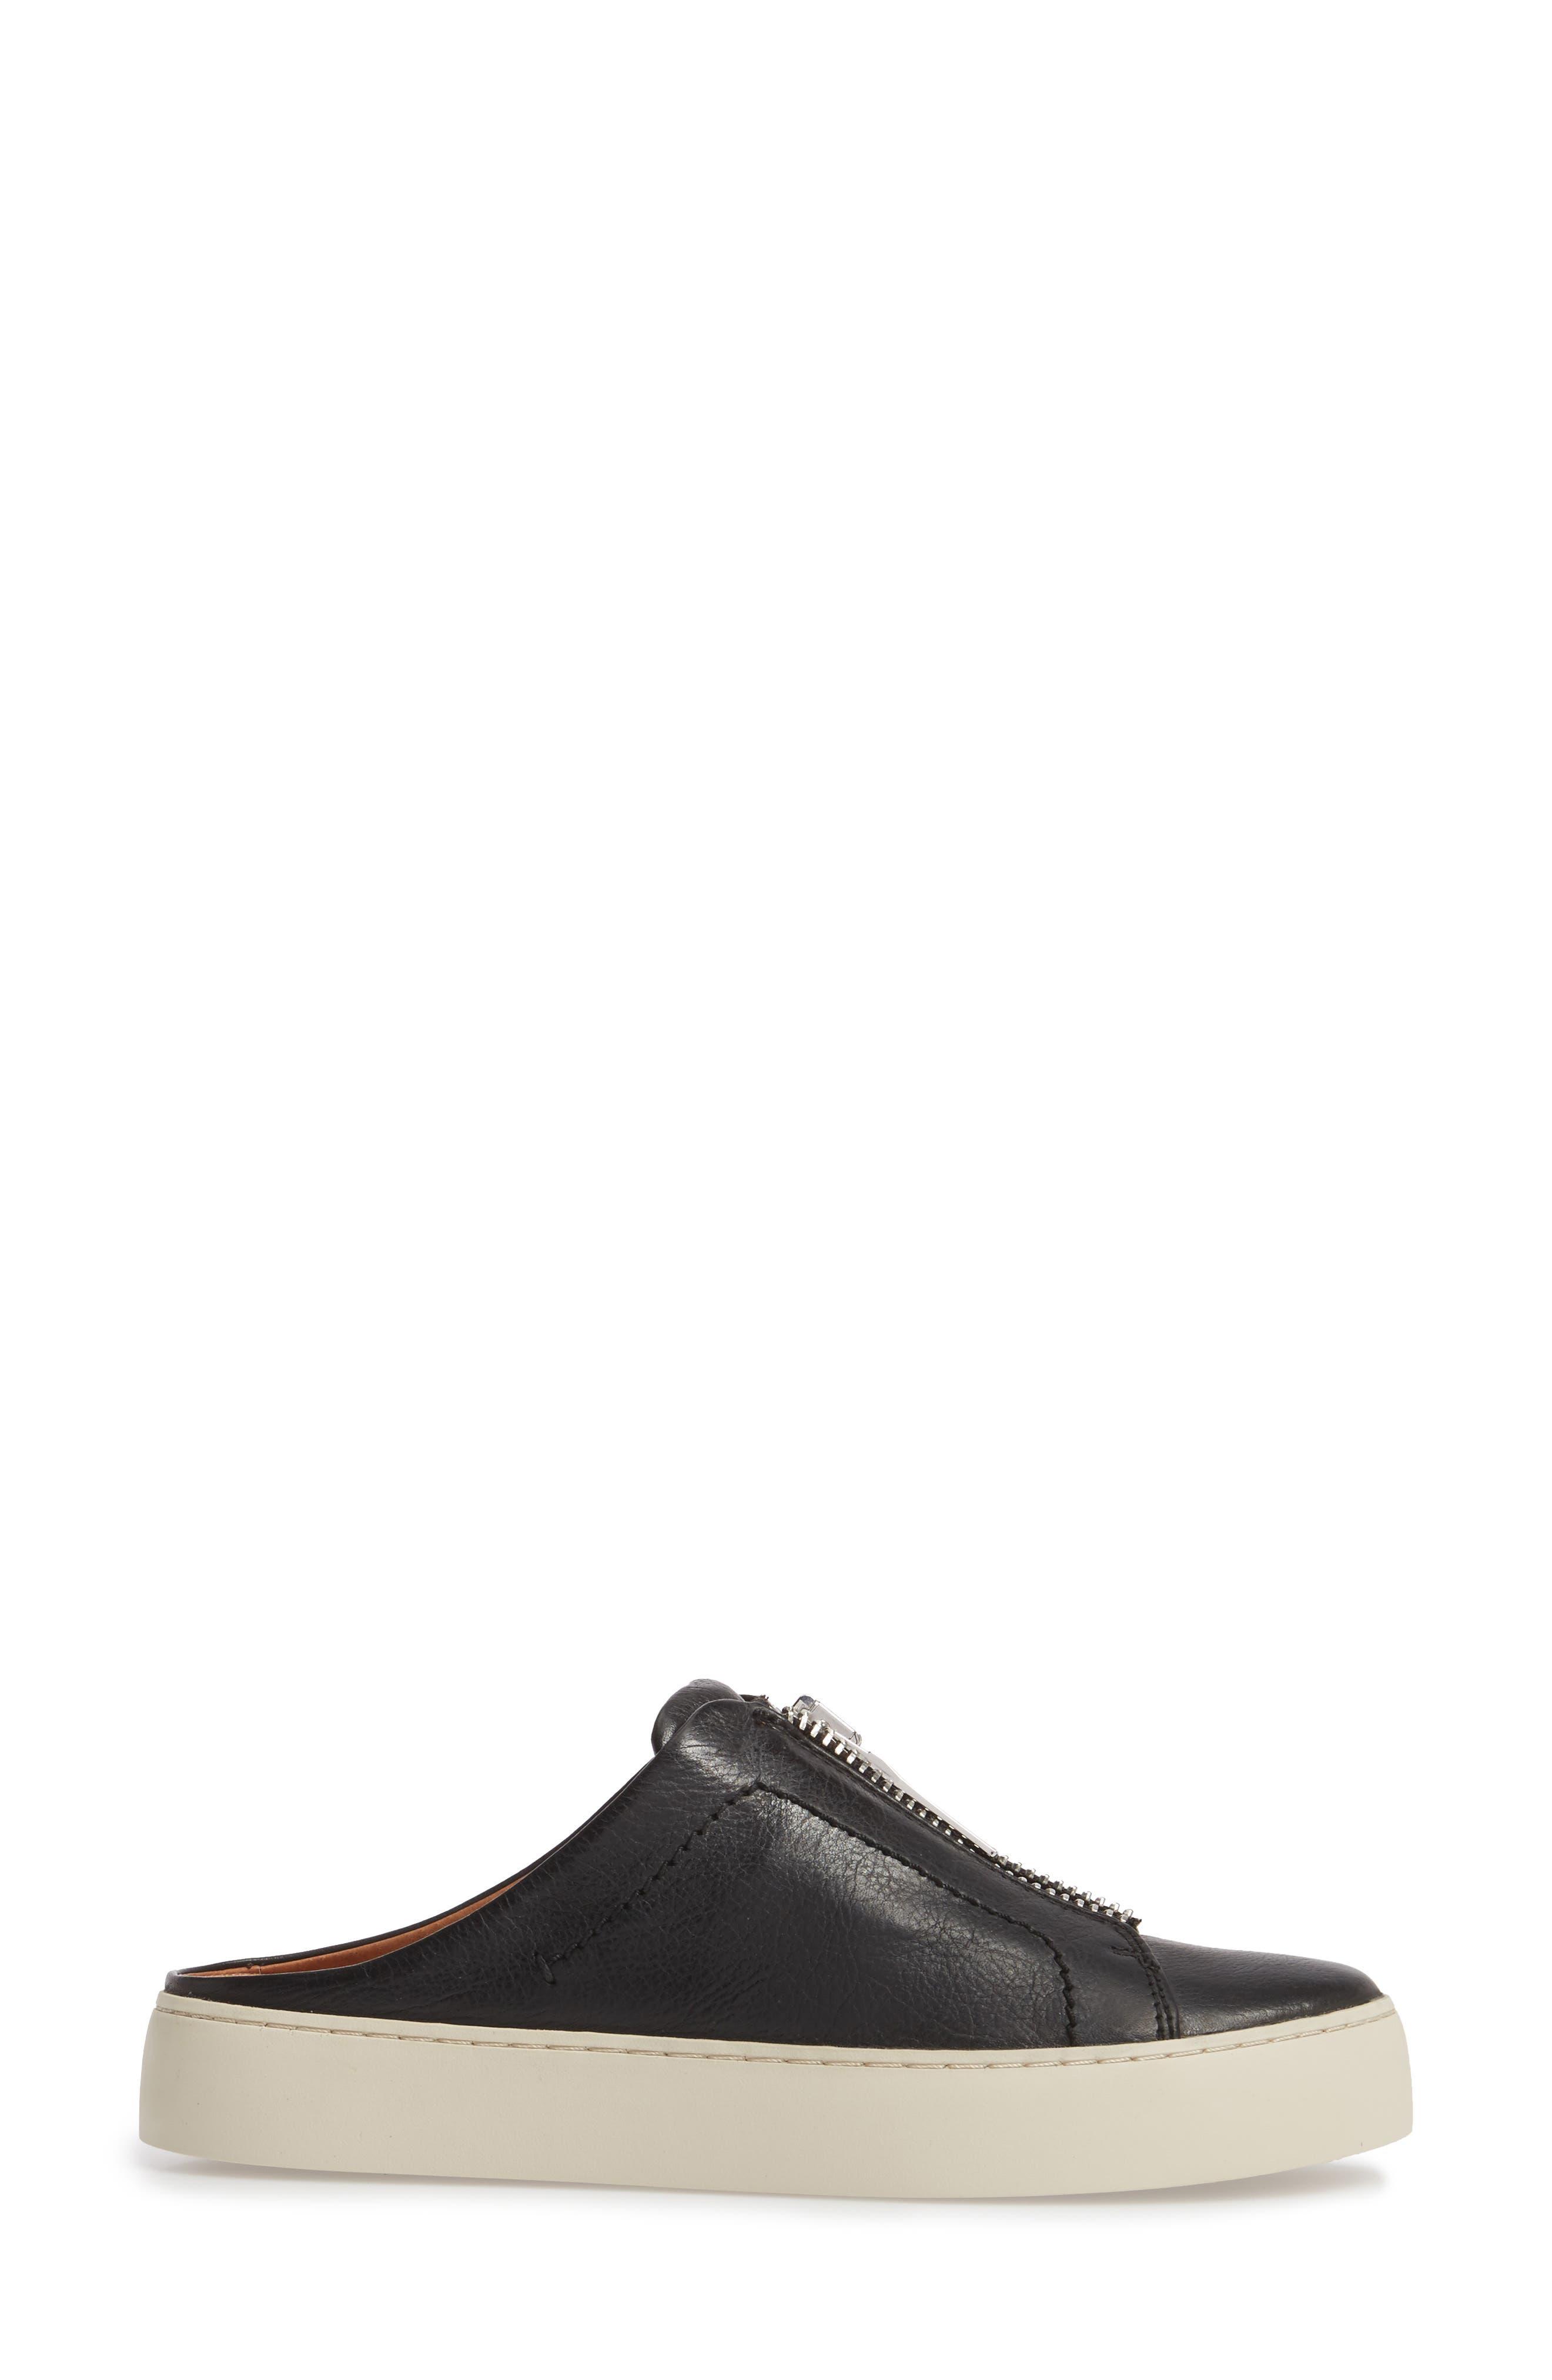 Lena Platform Sneaker Mule,                             Alternate thumbnail 3, color,                             001